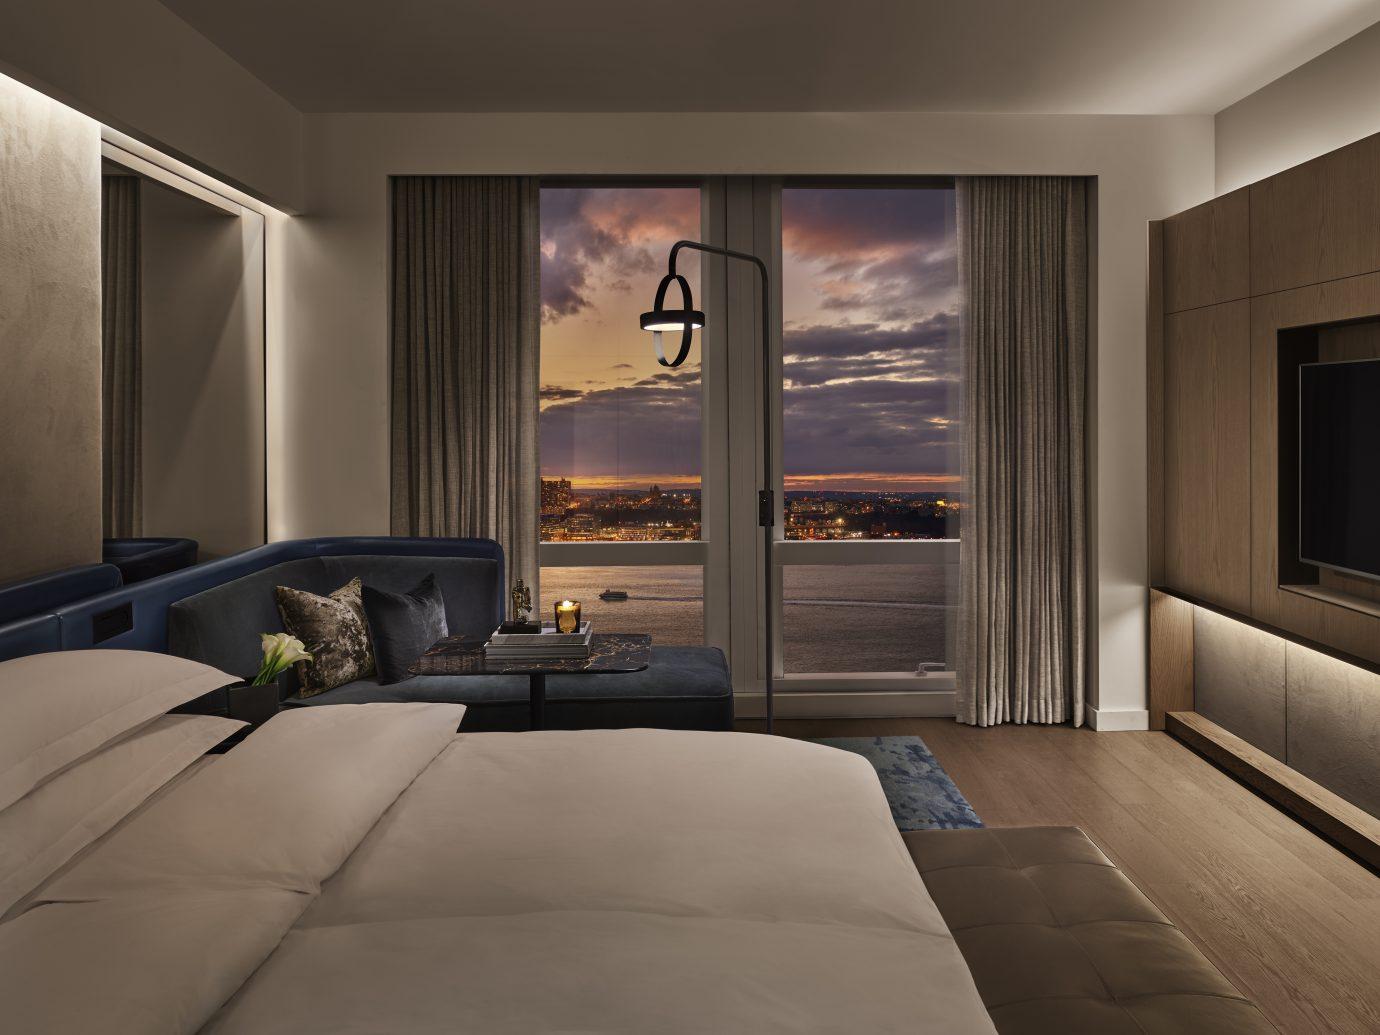 Equinox Hotel New York City